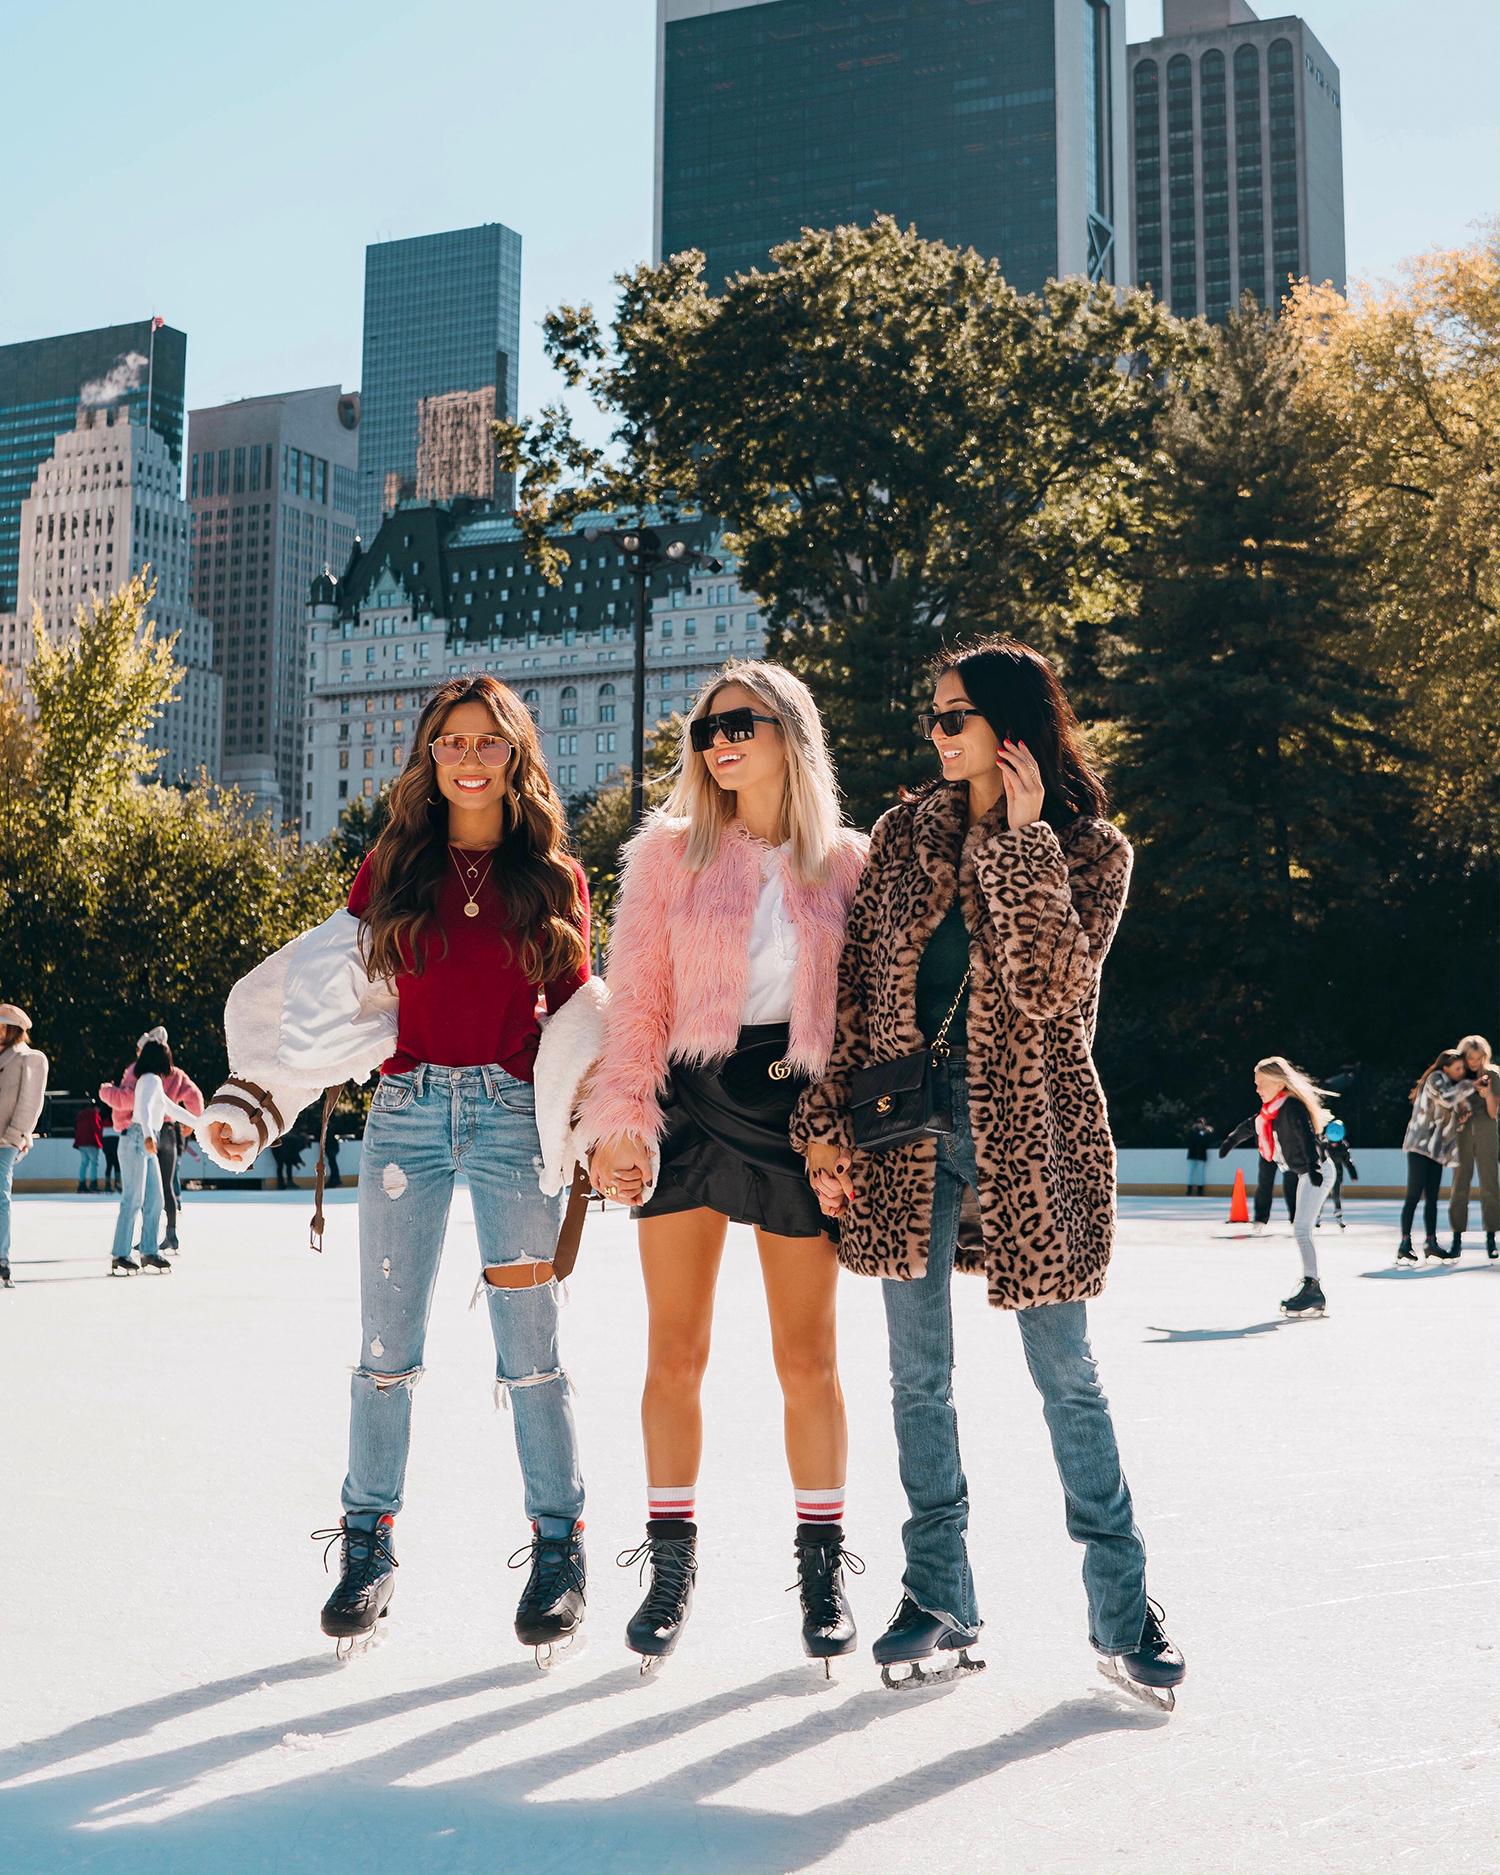 skating rink NYC Central Park